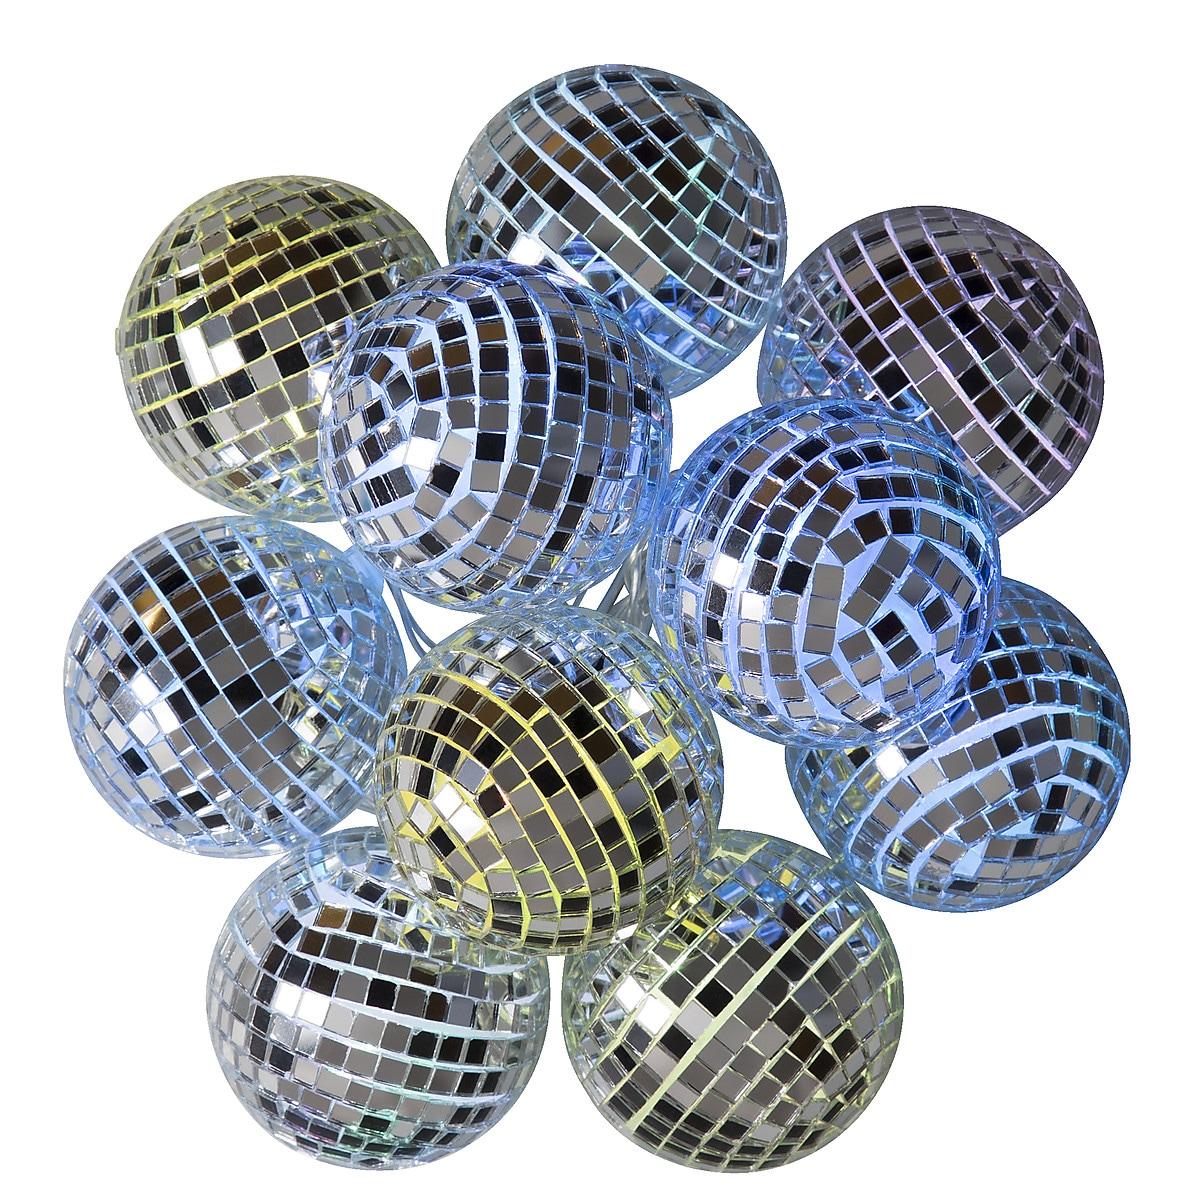 Batteridriven ljusslinga med discokulor